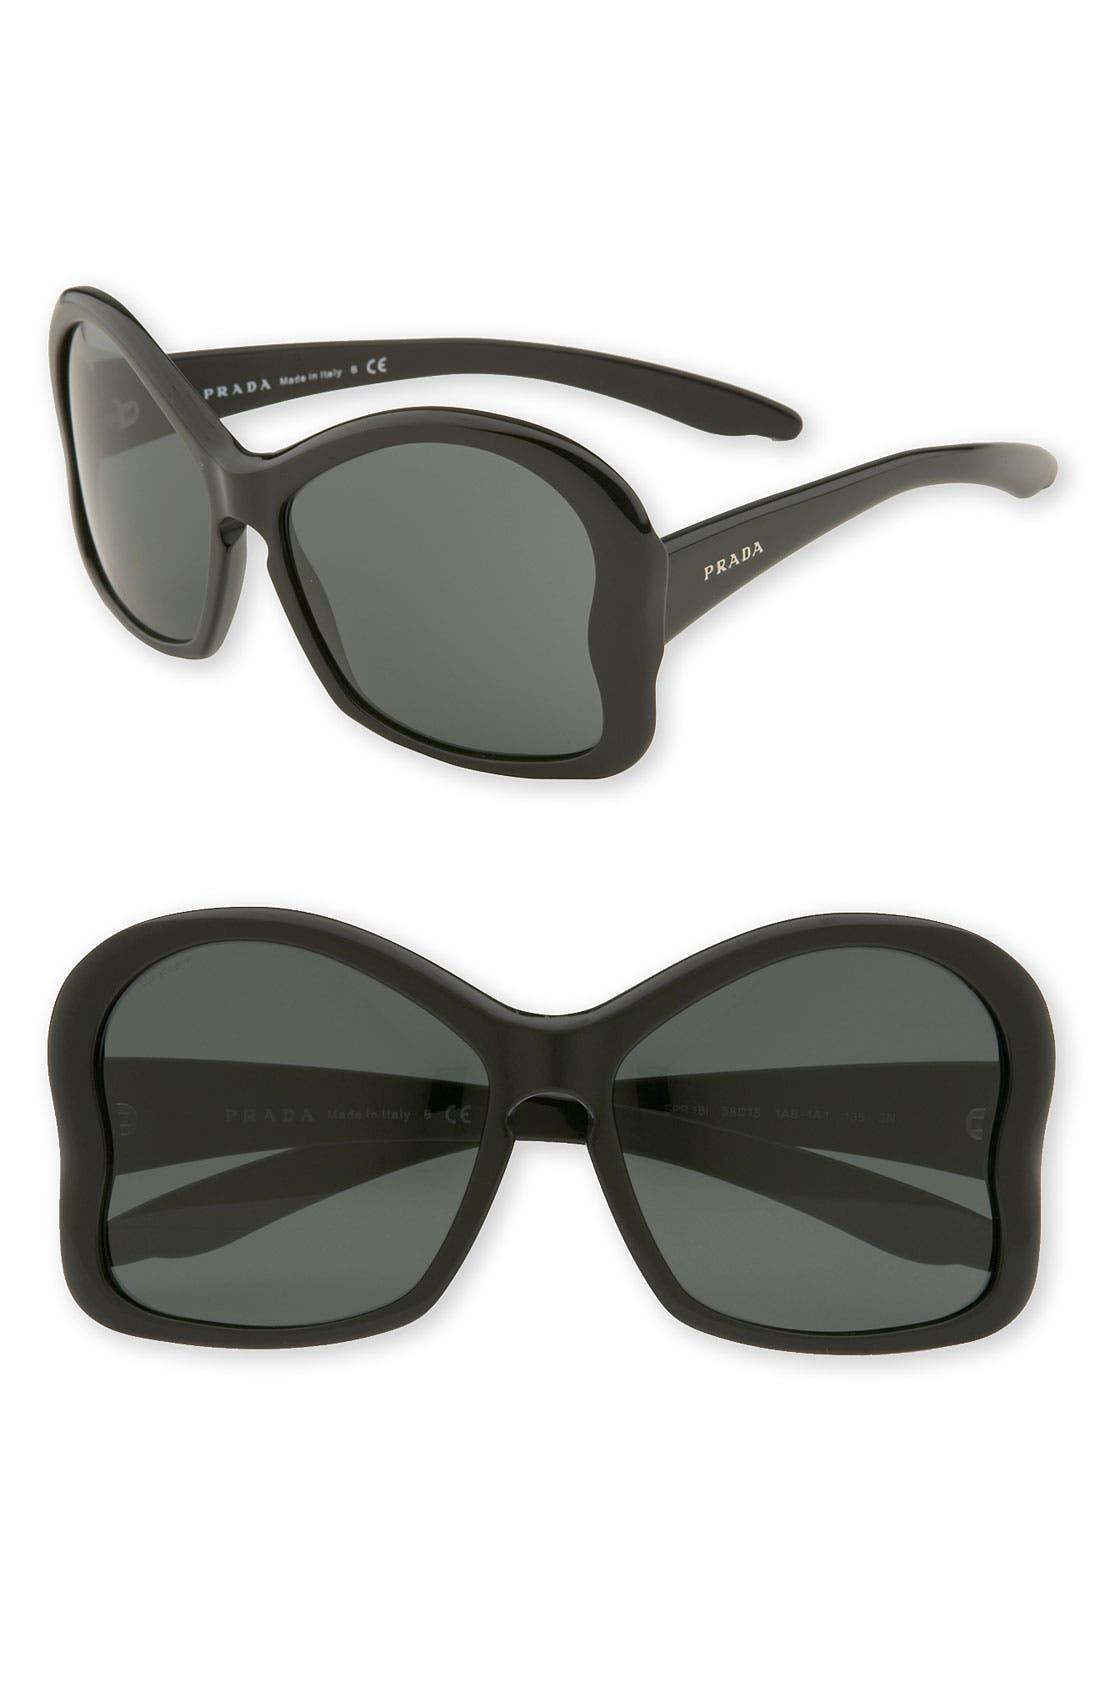 Main Image - Prada Large Butterfly Frame Sunglasses